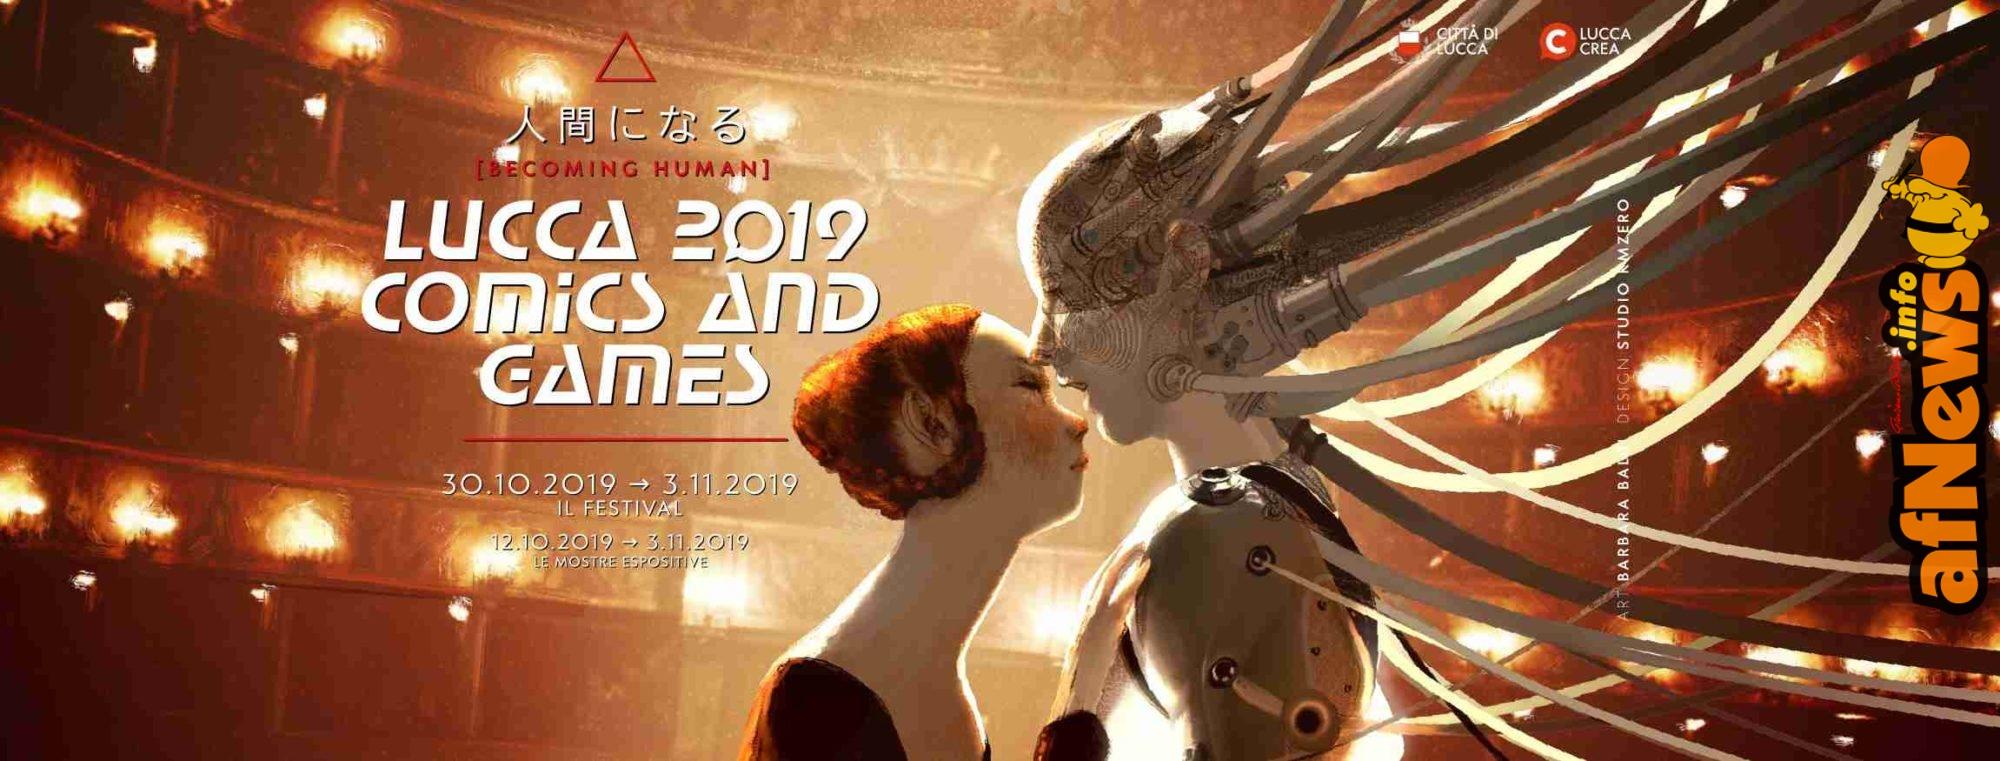 Lucca 2019: Hideo Azuma, Fumettibrutti e Zuzu e l'Audace vincono i Gran Guinigi - afnews.info